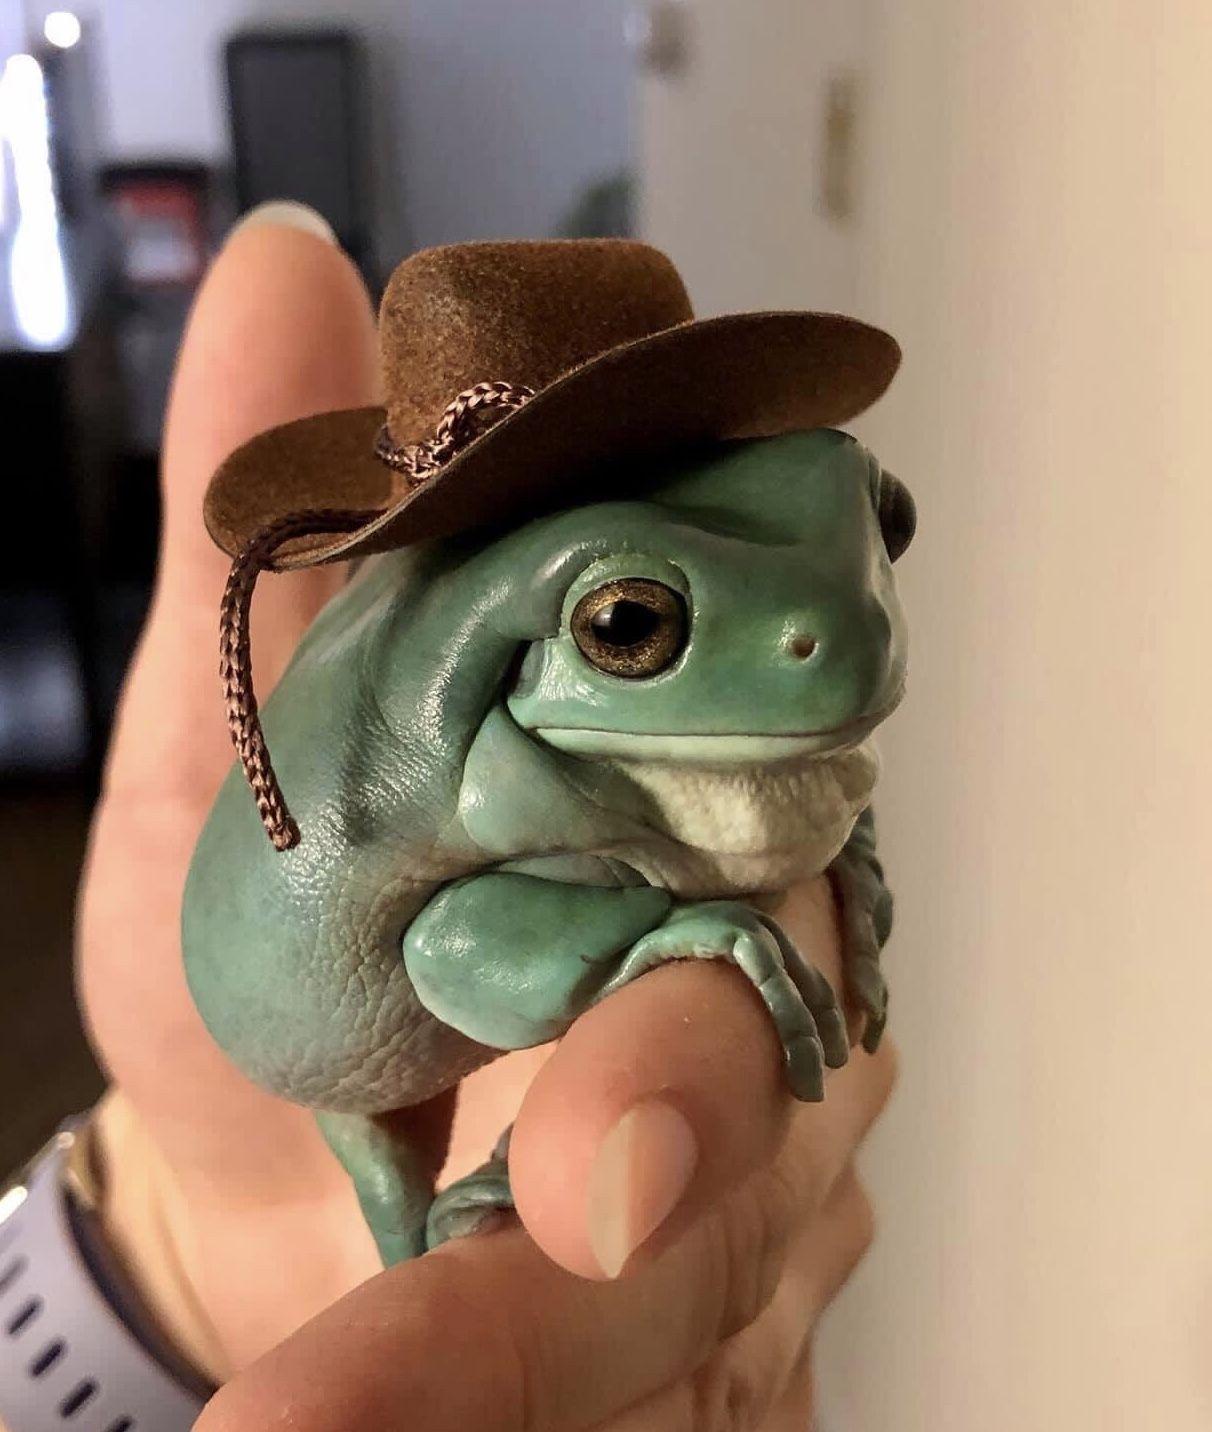 aes.┊finncore image by ˗ˏˋ finn ˎˊ˗ in 2020 Cute frogs